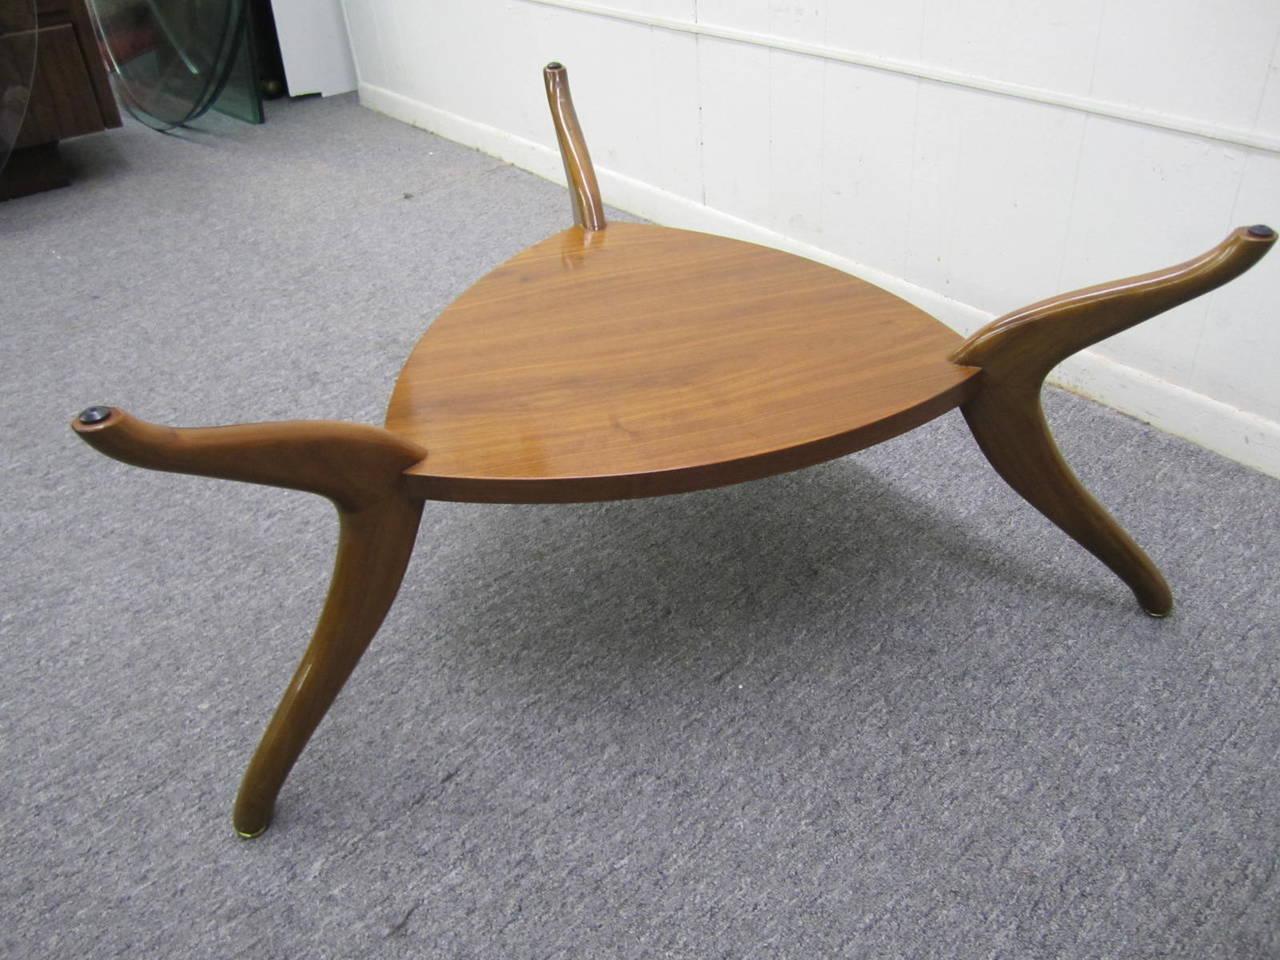 Sculptural Vladimir Kagan Style Triangular Coffee Table Mid Century Modern For Sale At 1stdibs